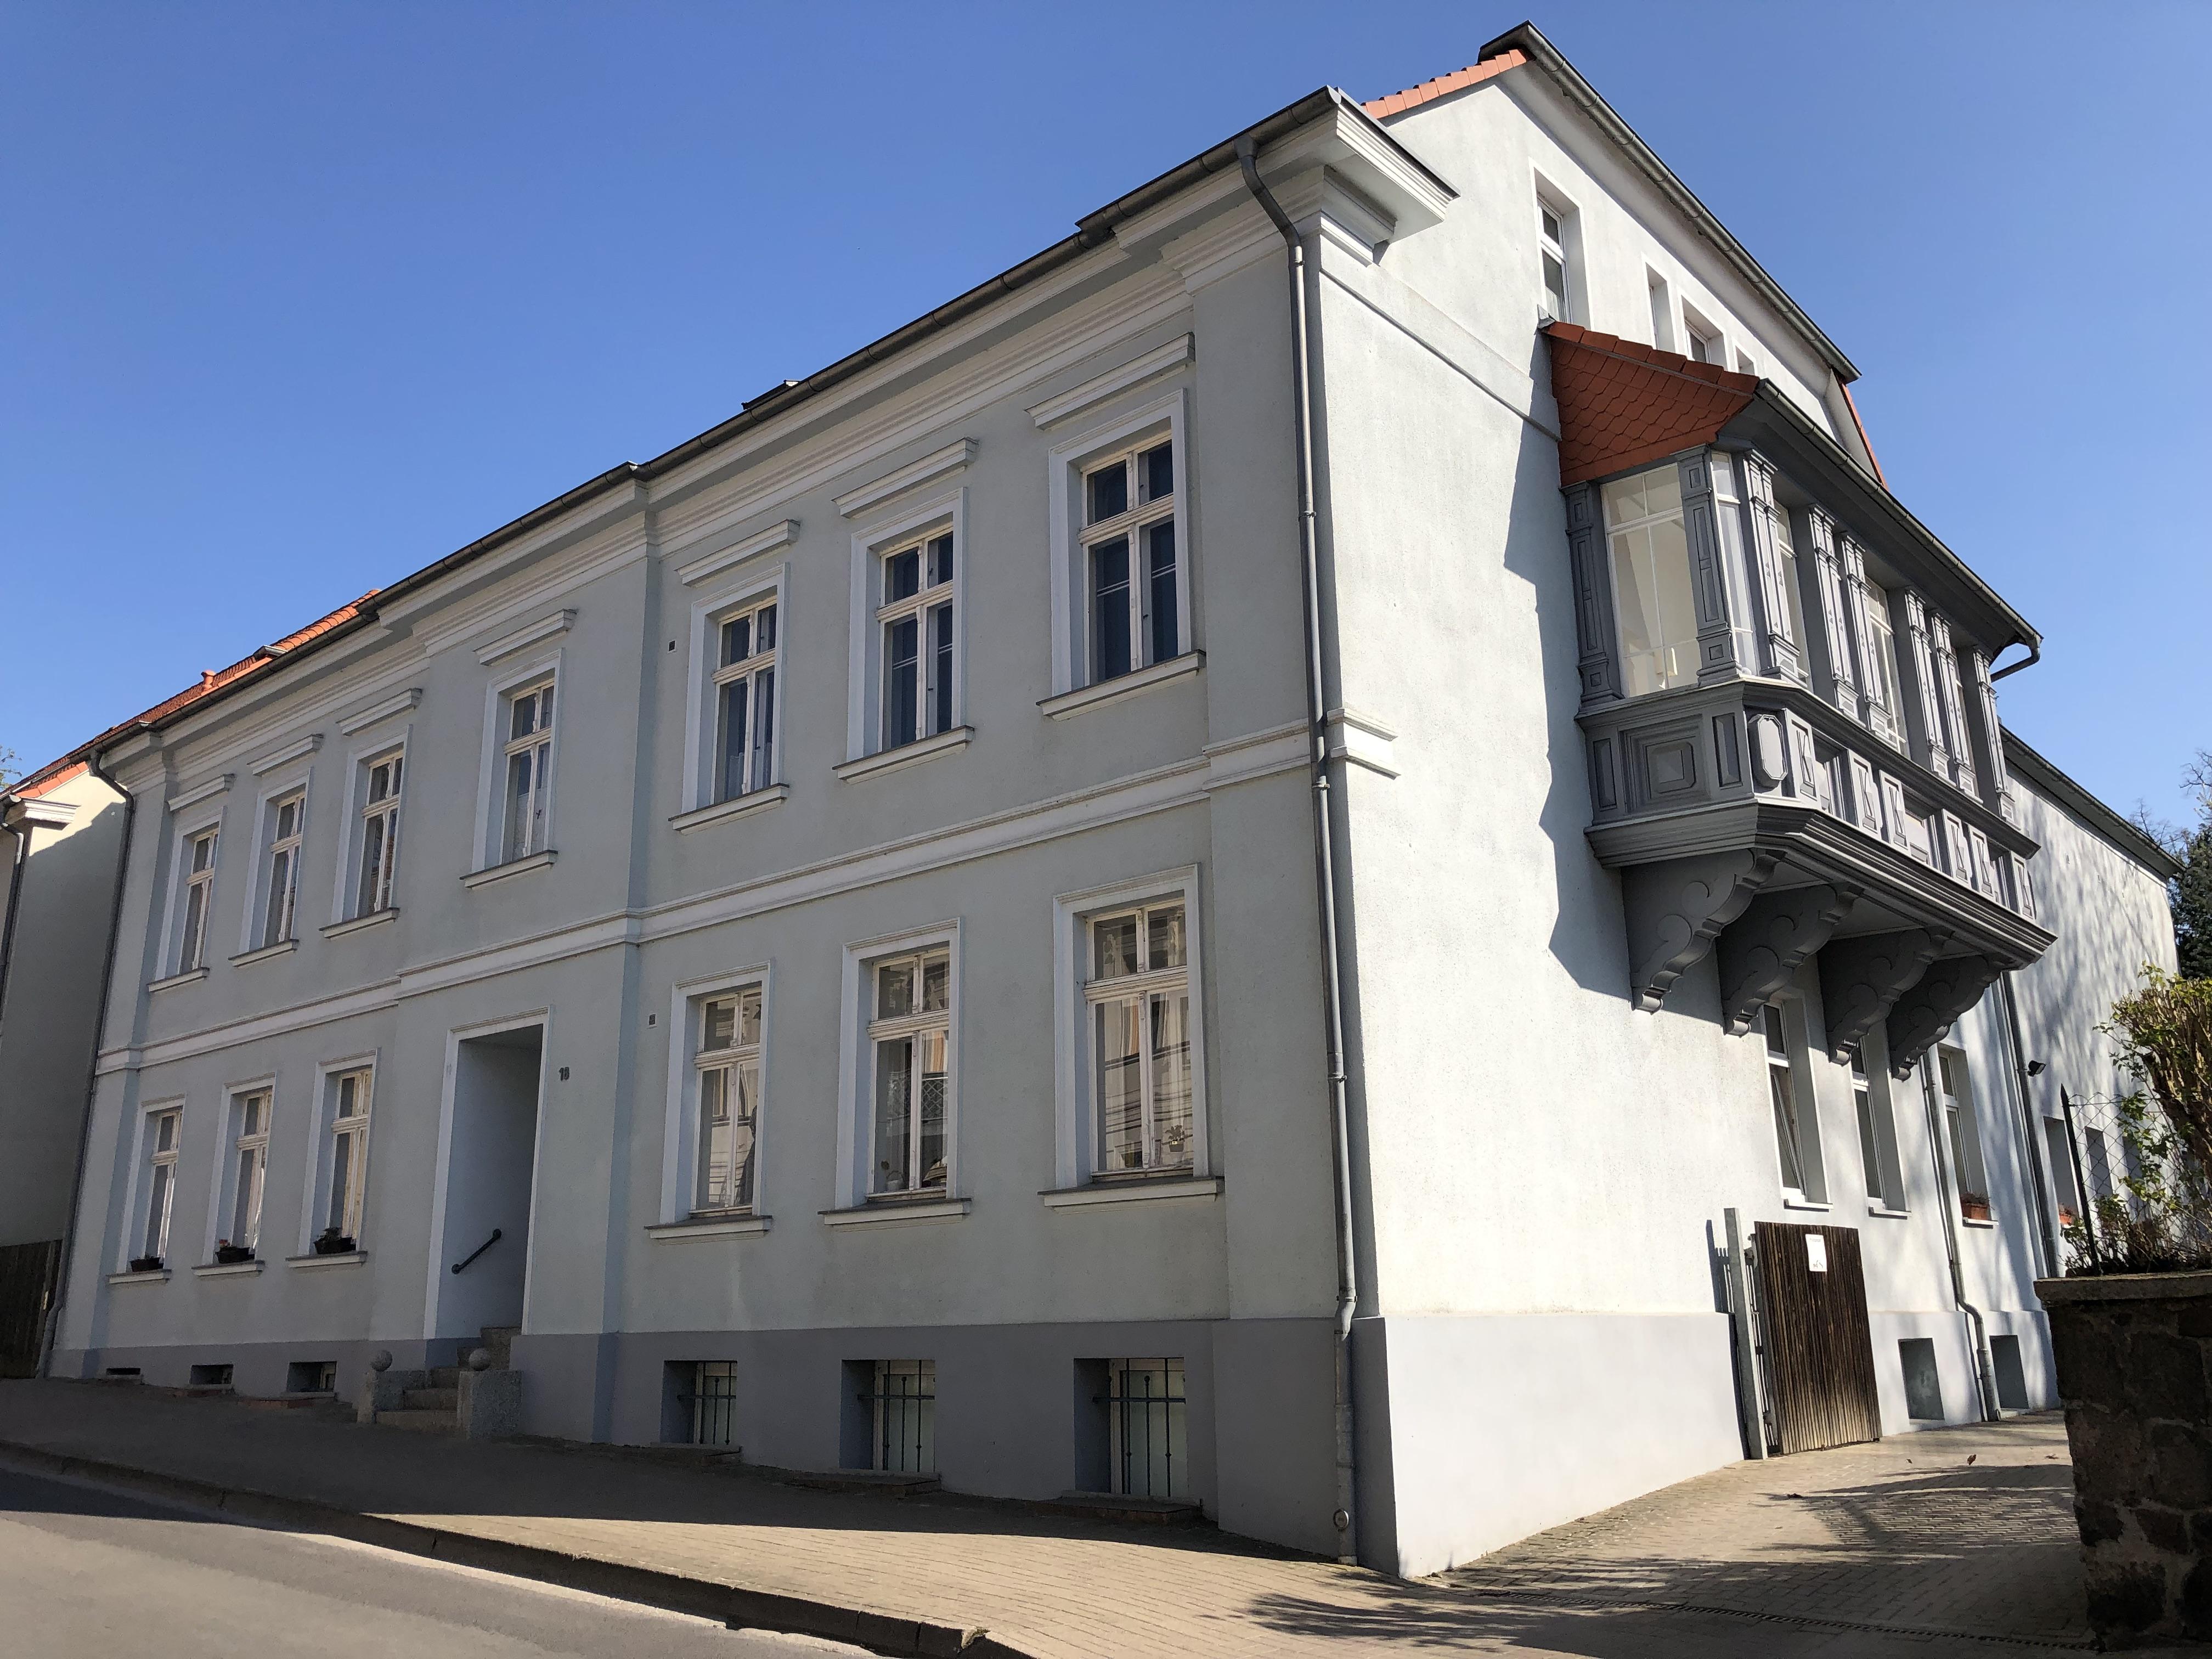 Tiergartenstraße 18